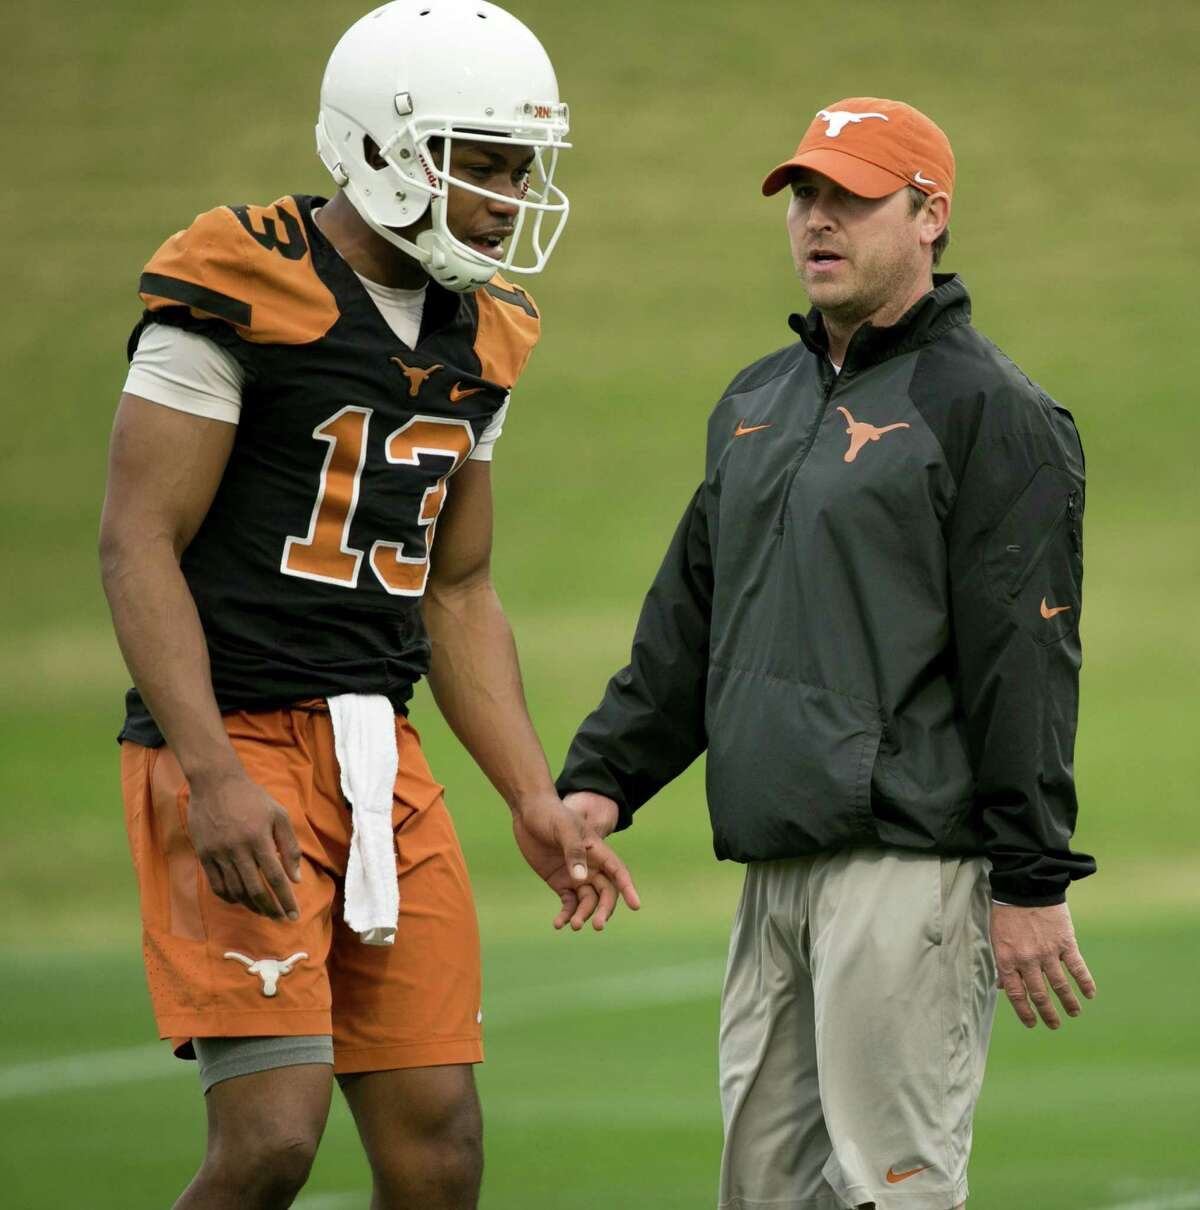 UT offensive coordinator Sterlin Gilbert talks to quarterback Jerrod Heard during the first spring practice at Denius Fields on March 7, 2016, in Austin